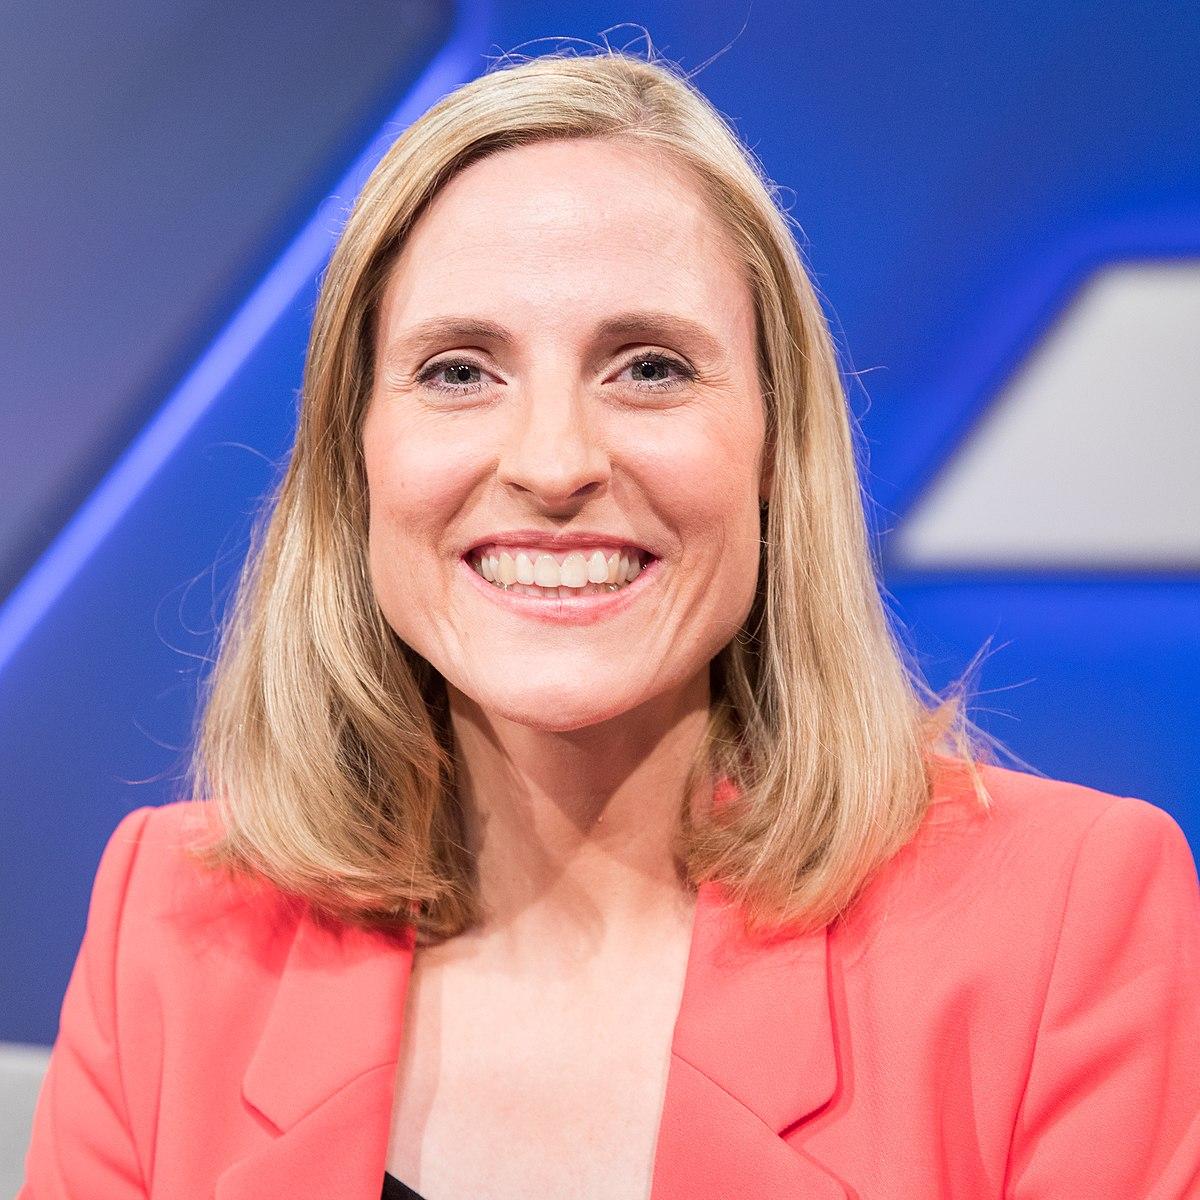 Marie-Christine Ostermann